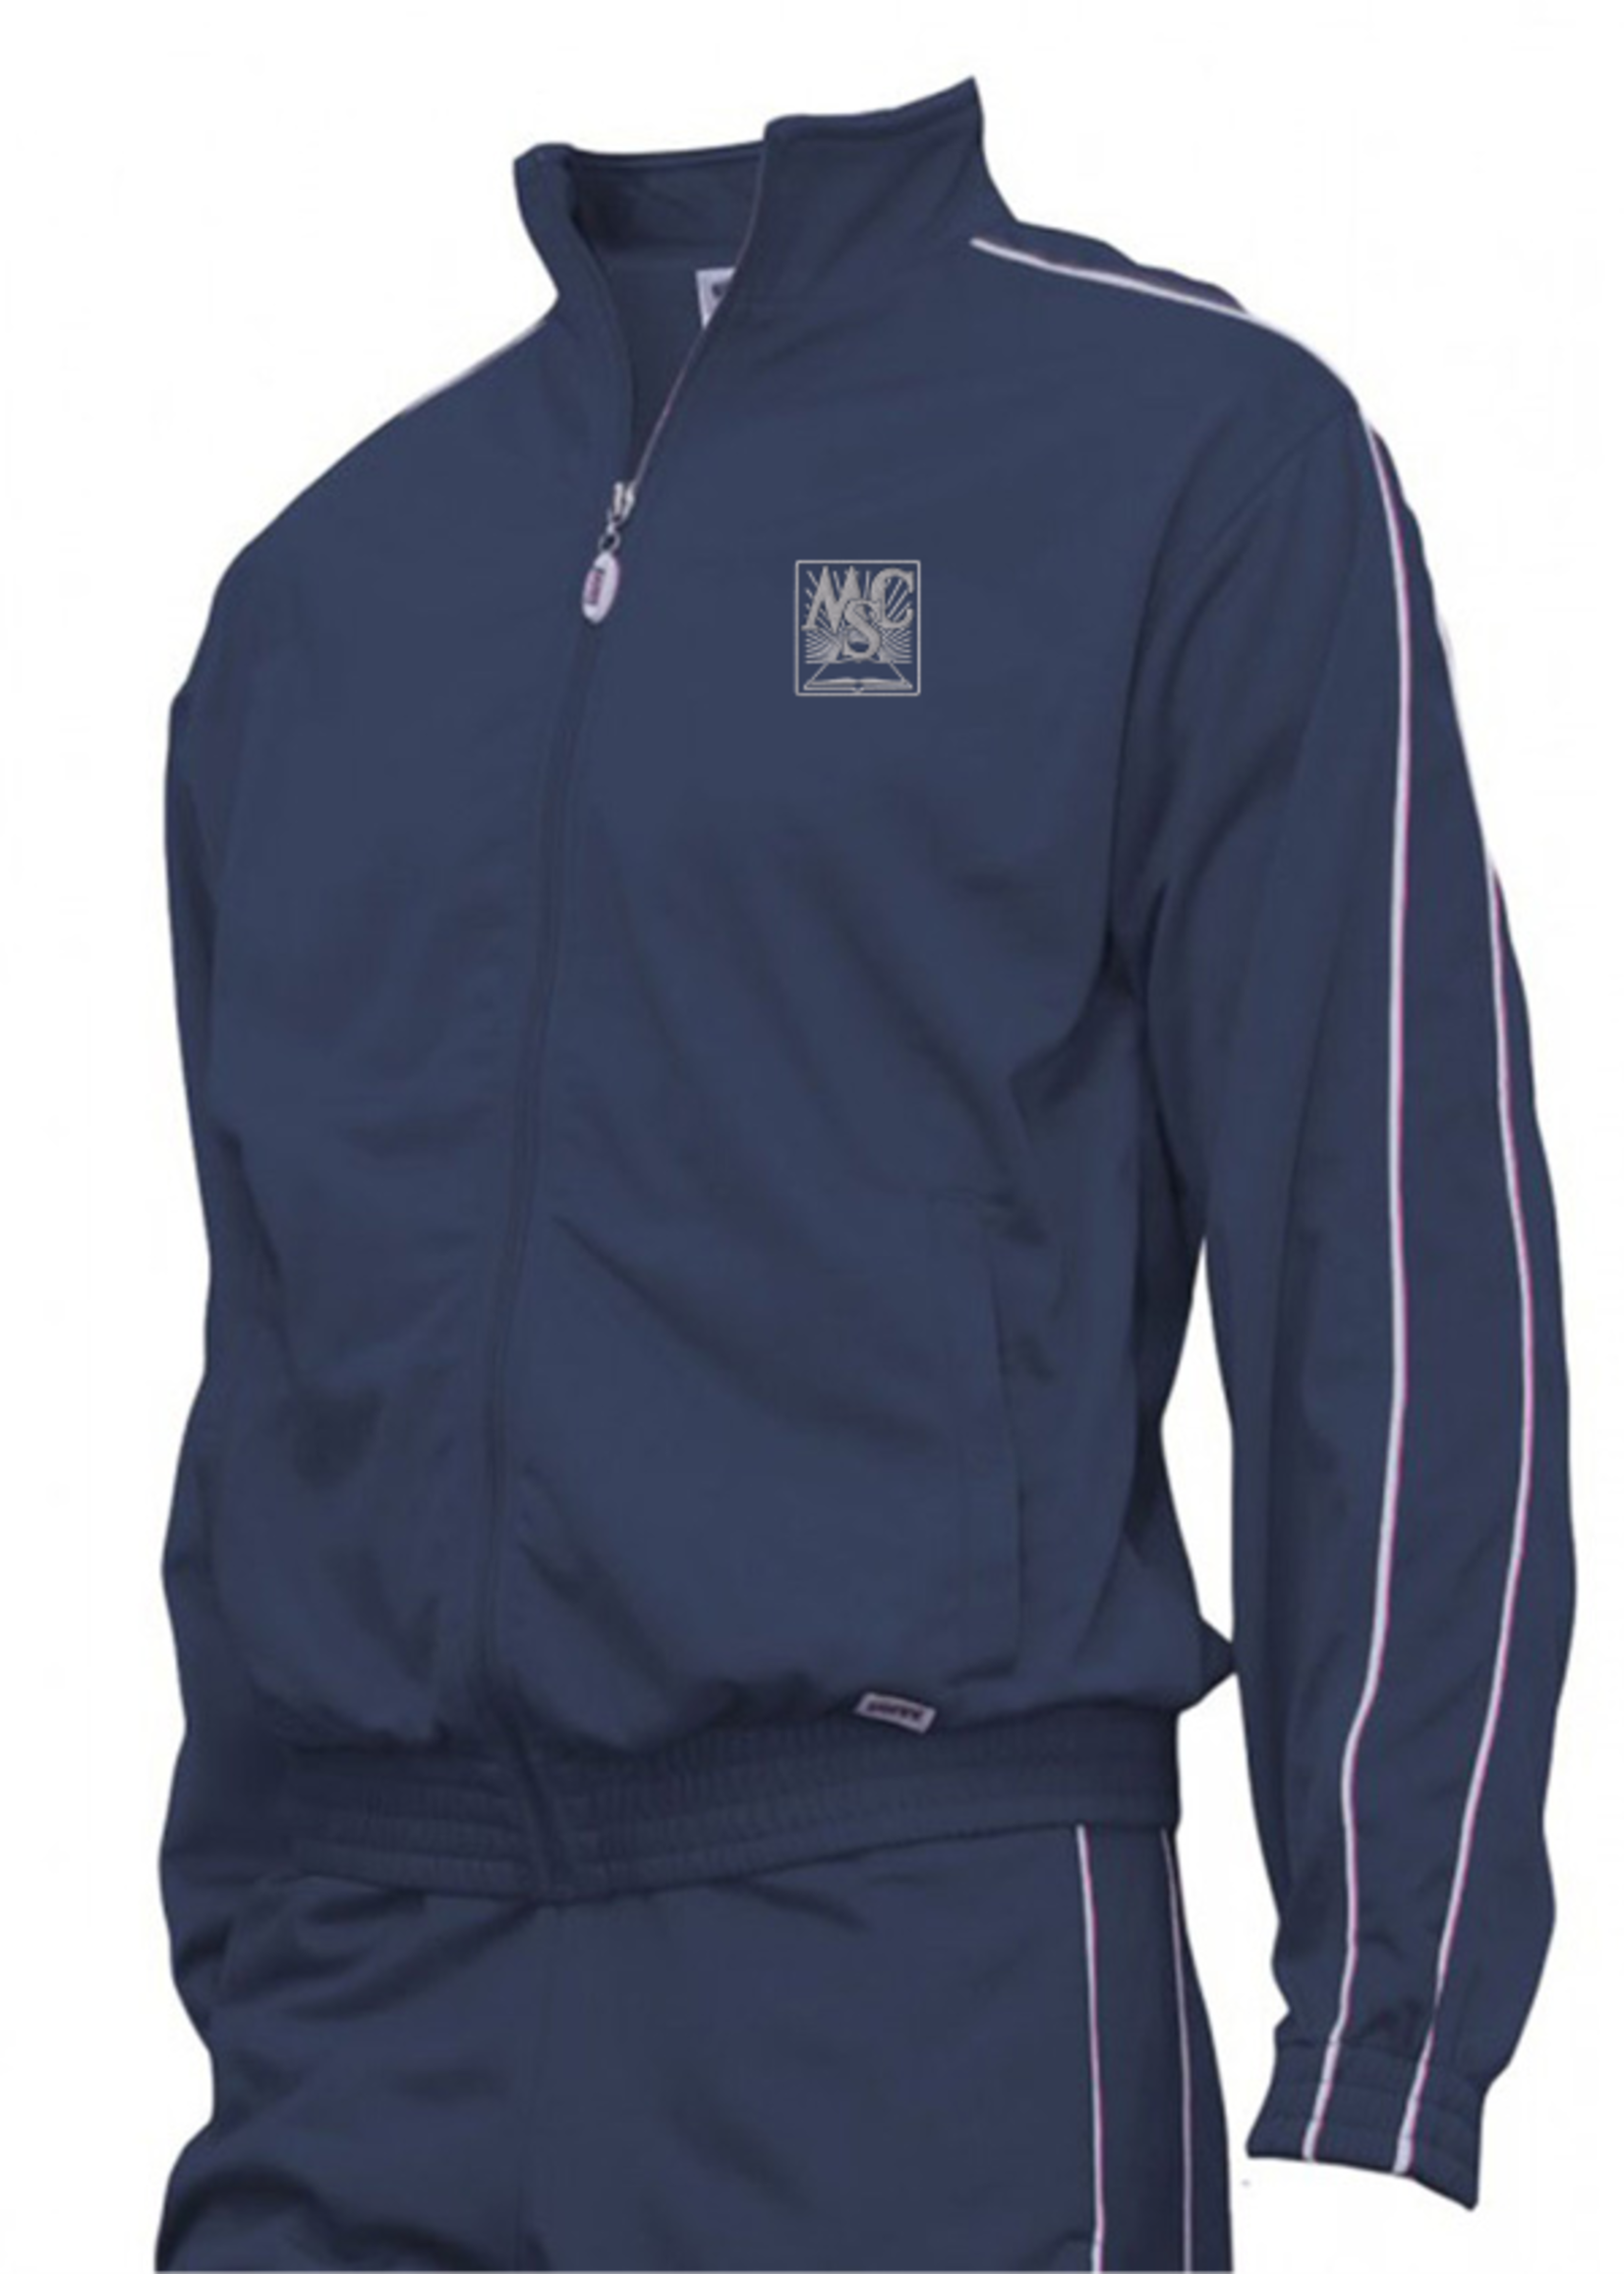 OLMCS Navy Tricot Warm Up Jacket